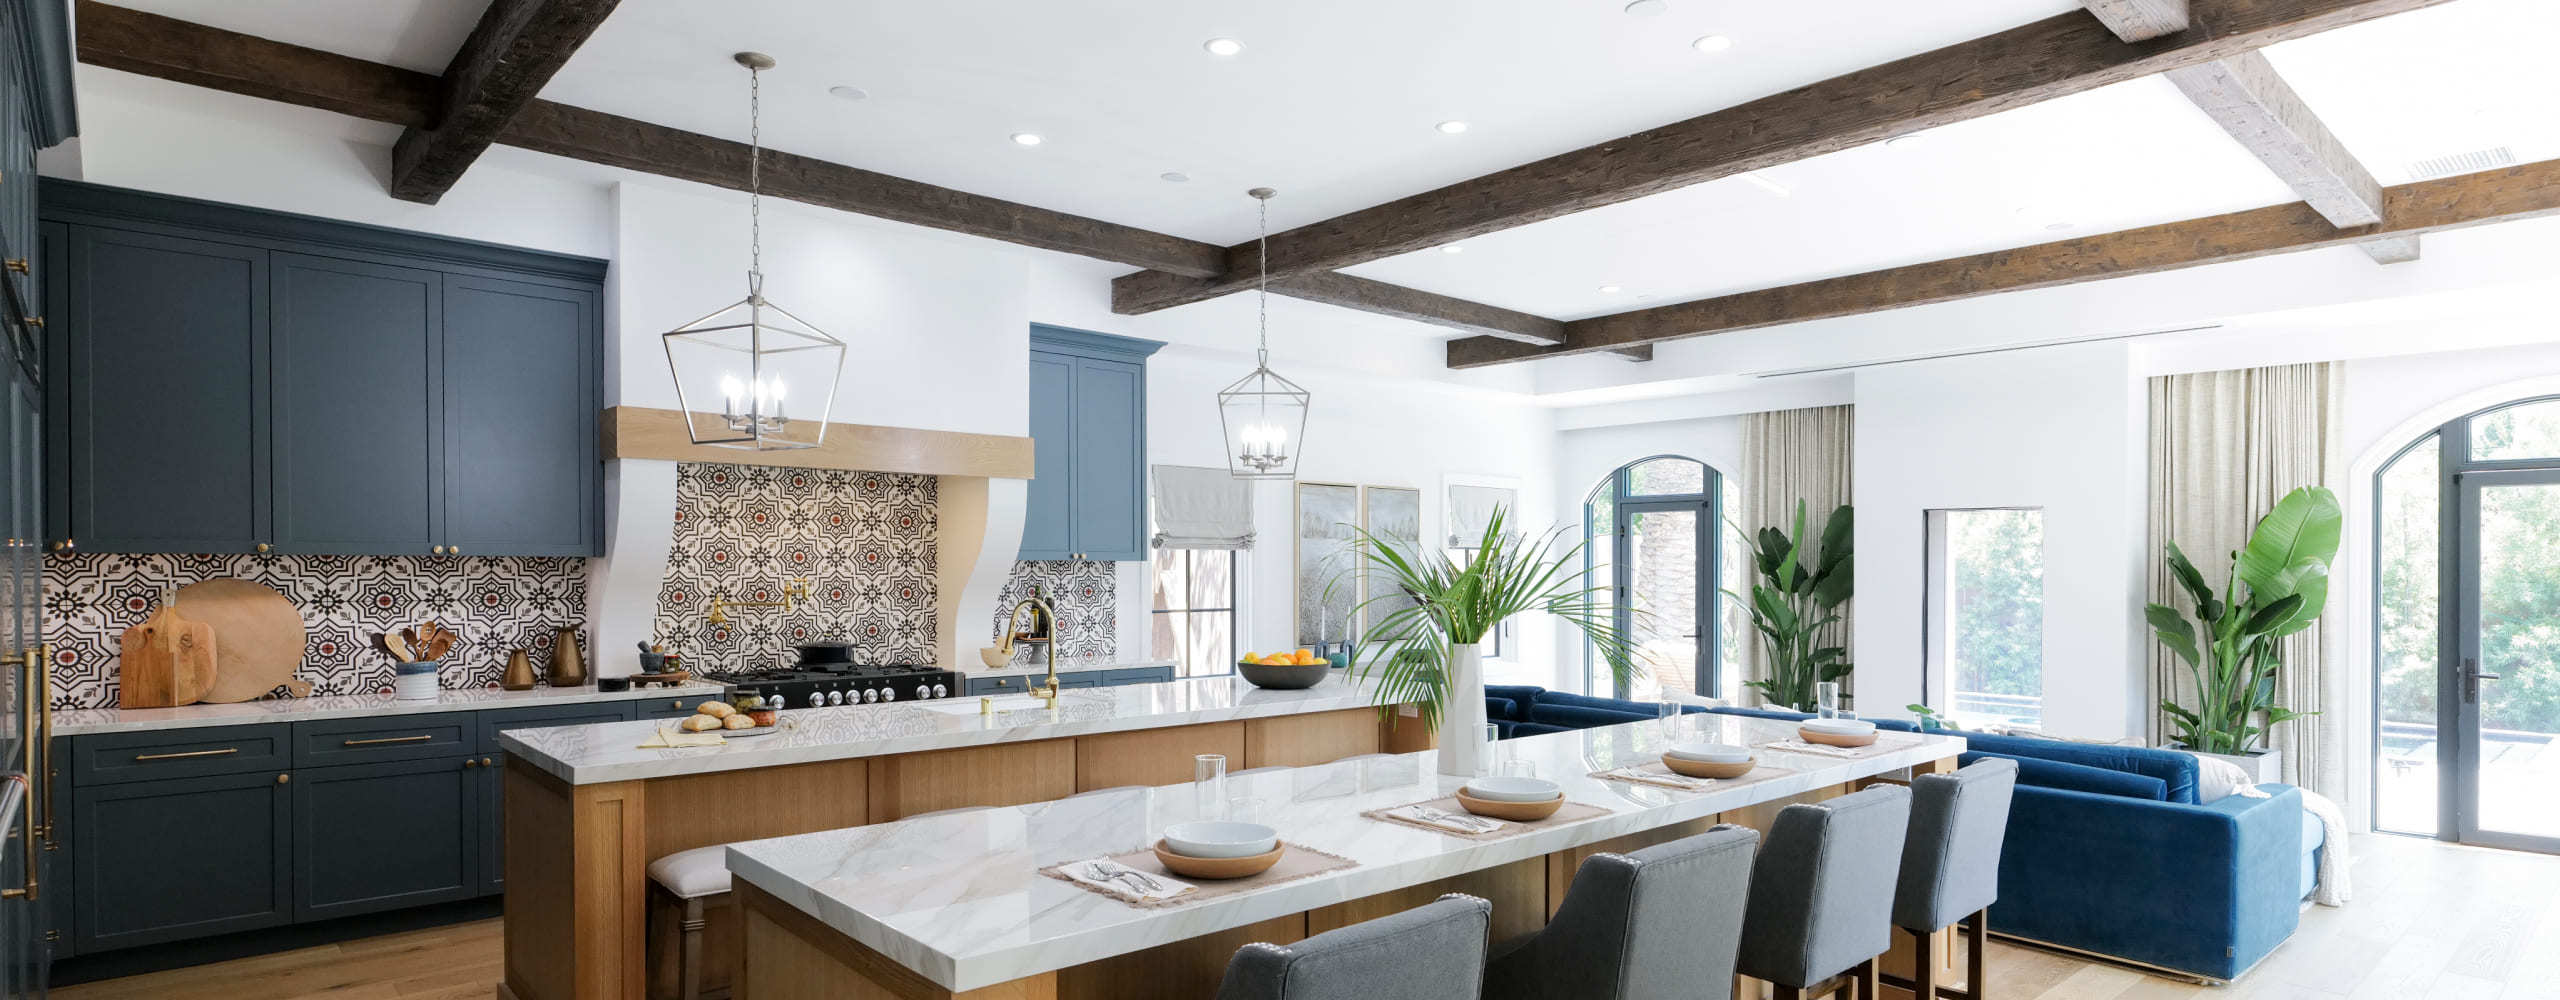 Desktop-Kitchen Design with faux wood ceiling beams